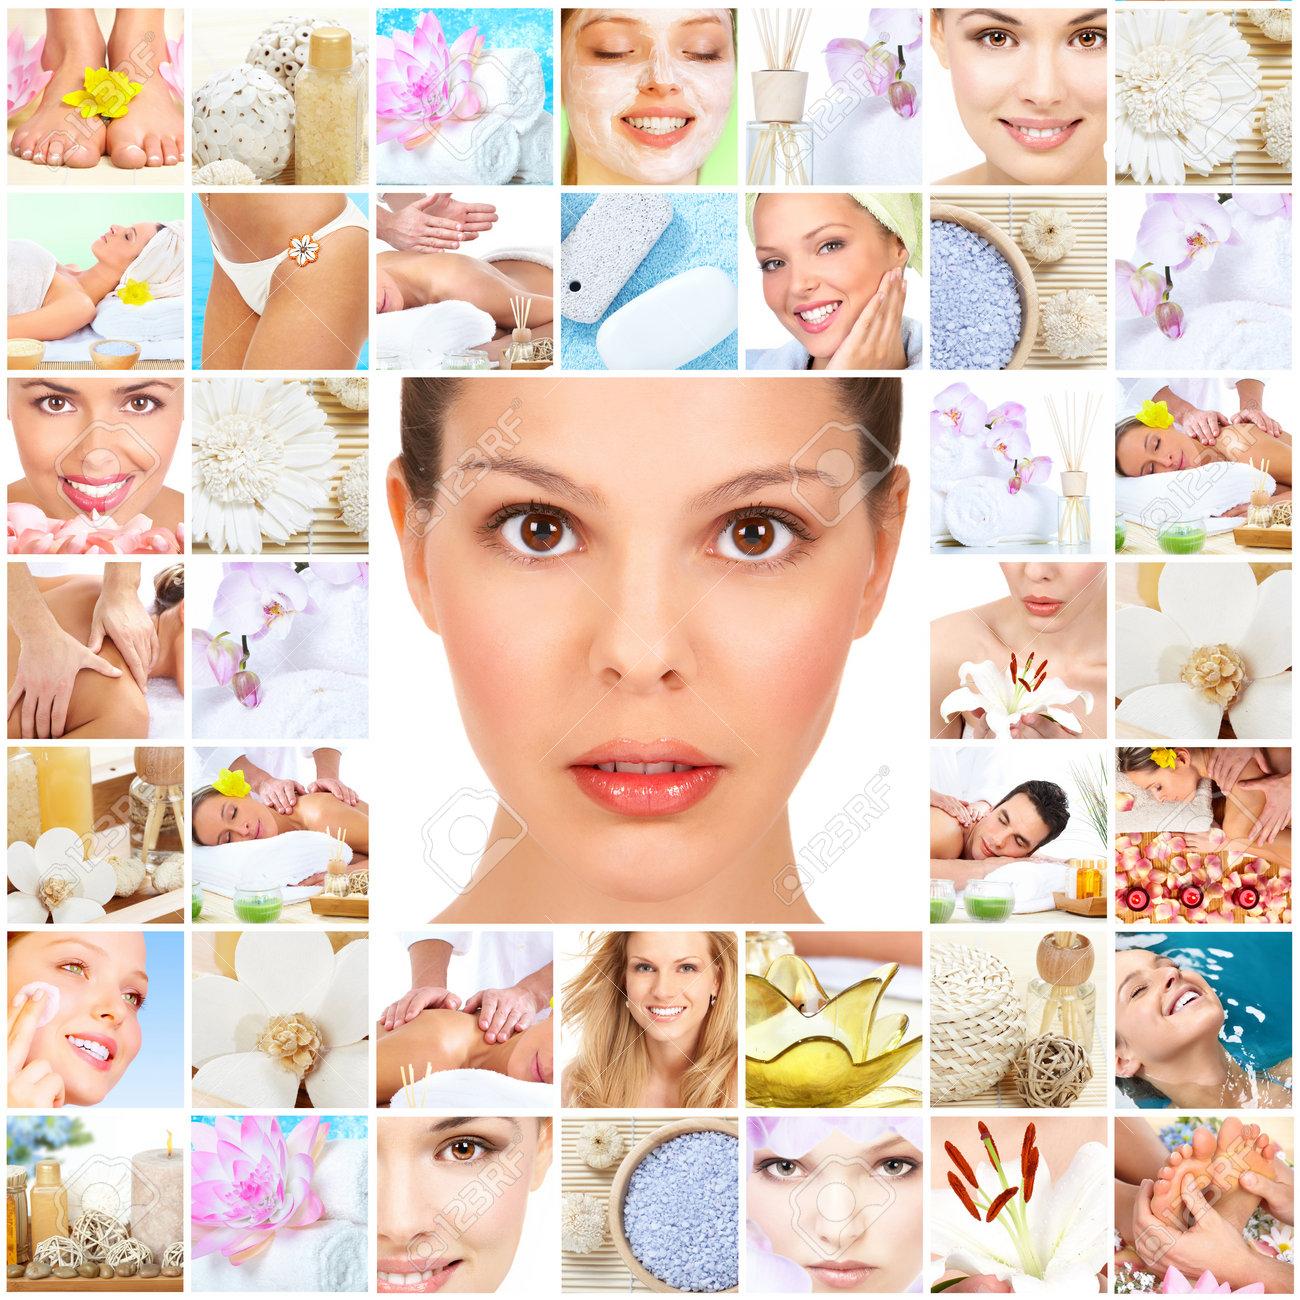 Spa massage collage background. Stock Photo - 11992319